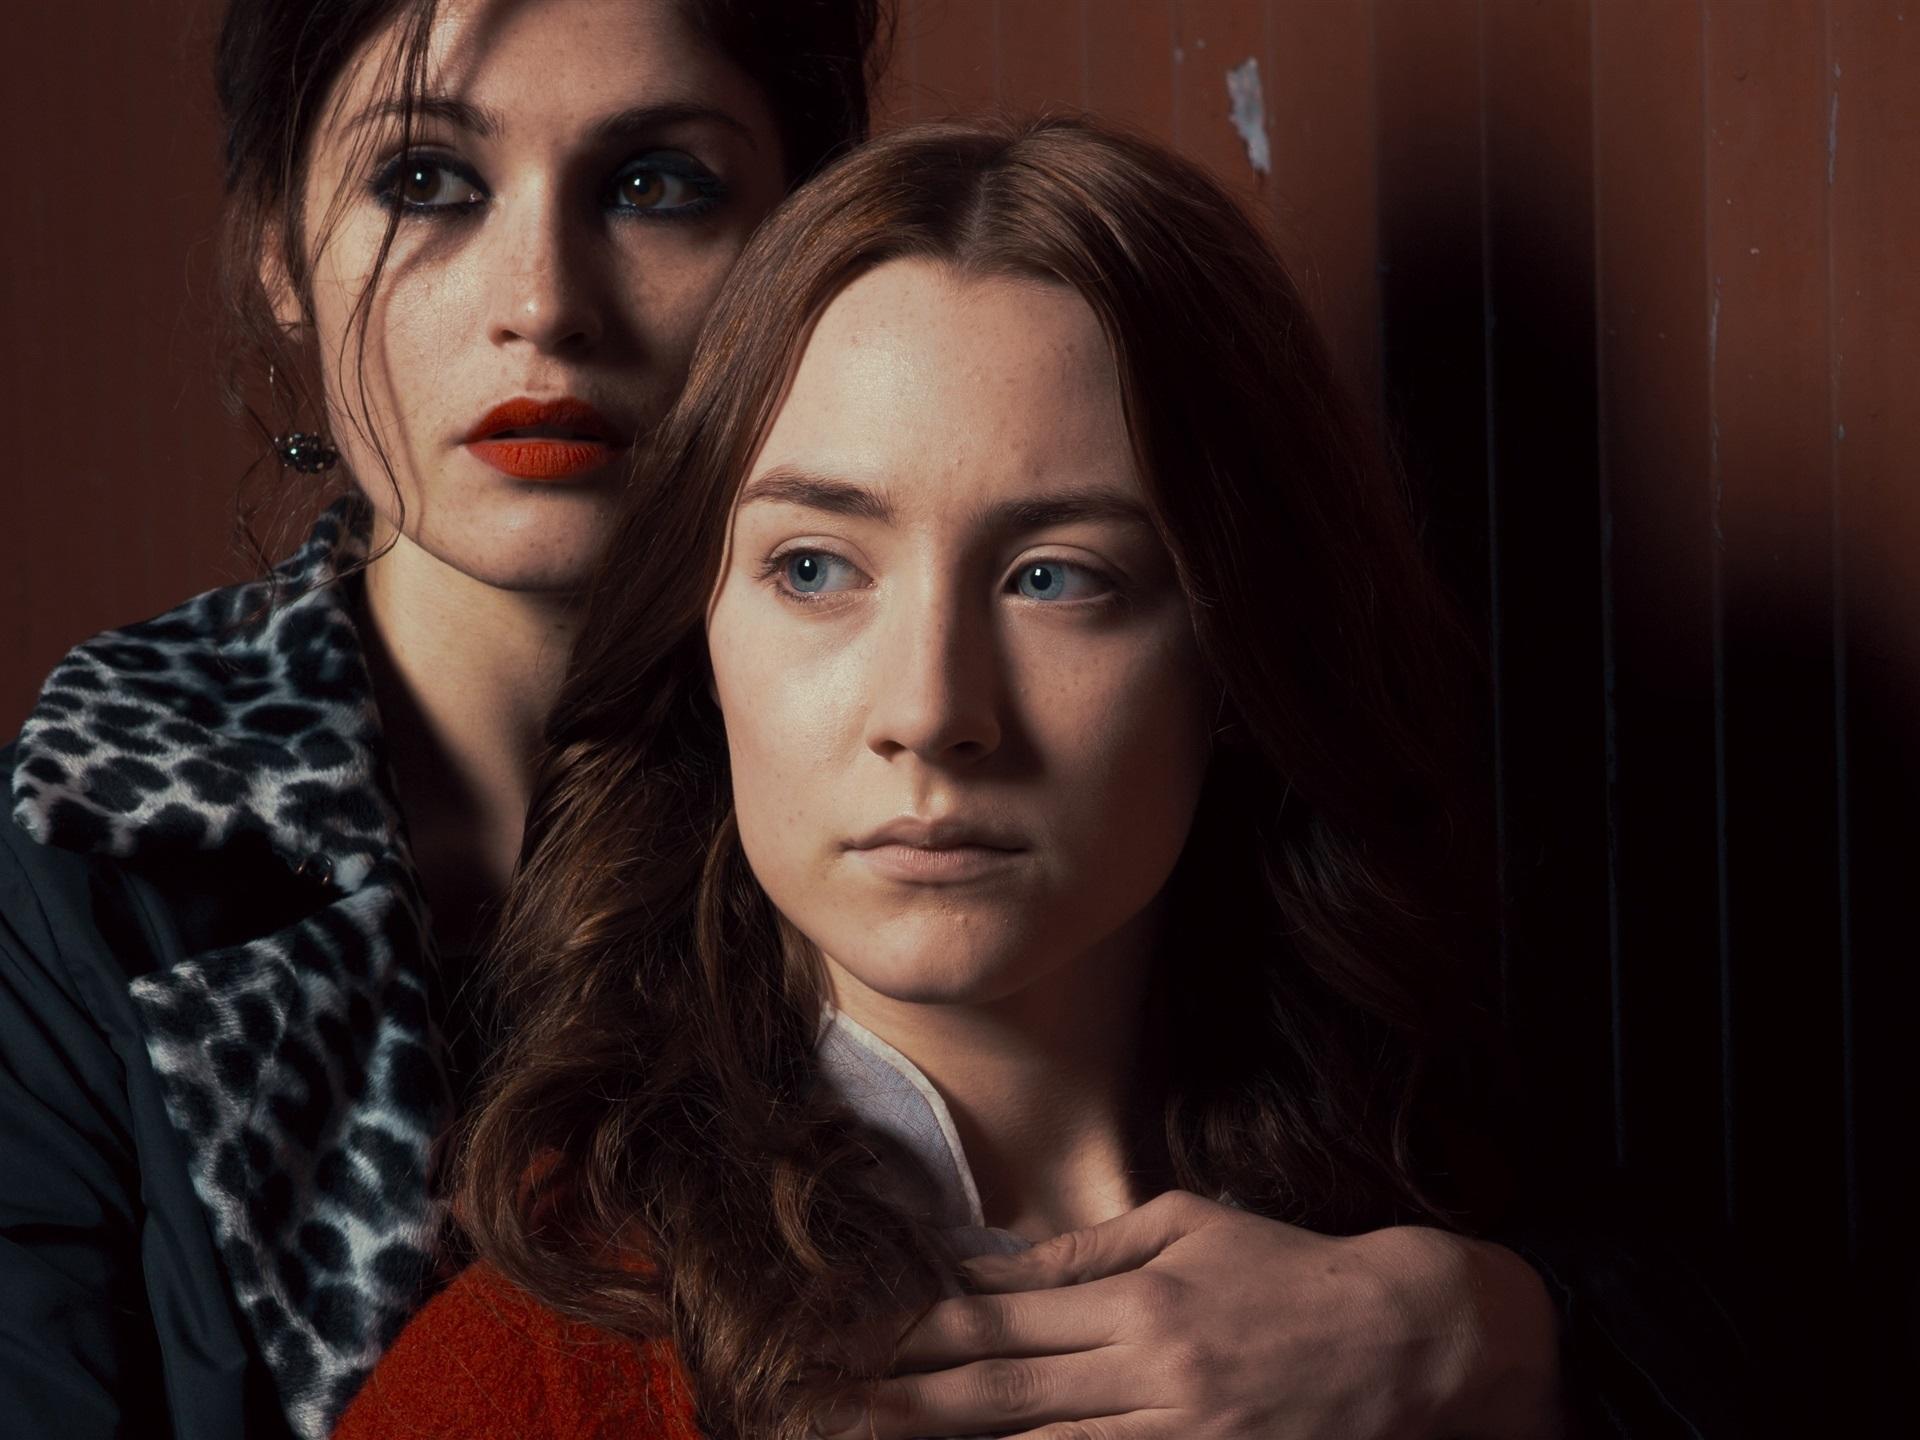 Saoirse Ronan Gemma Arterton Byzantium movie Wallpapers